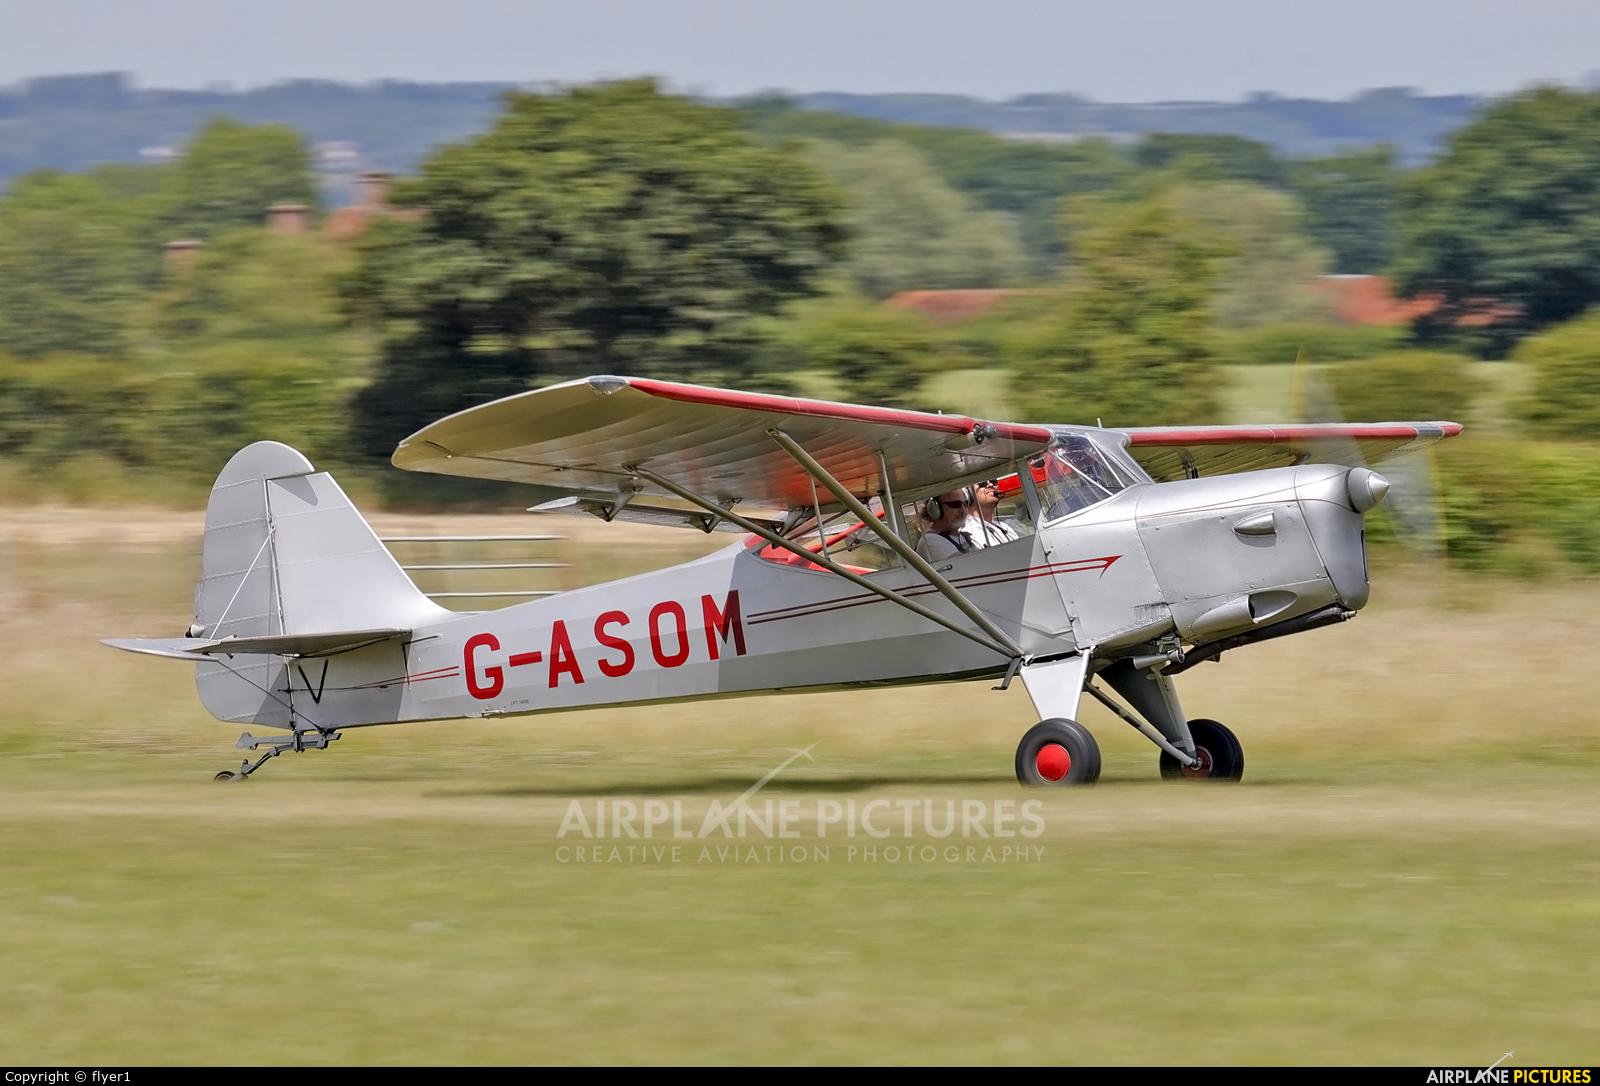 Private G-ASOM aircraft at Lashenden / Headcorn